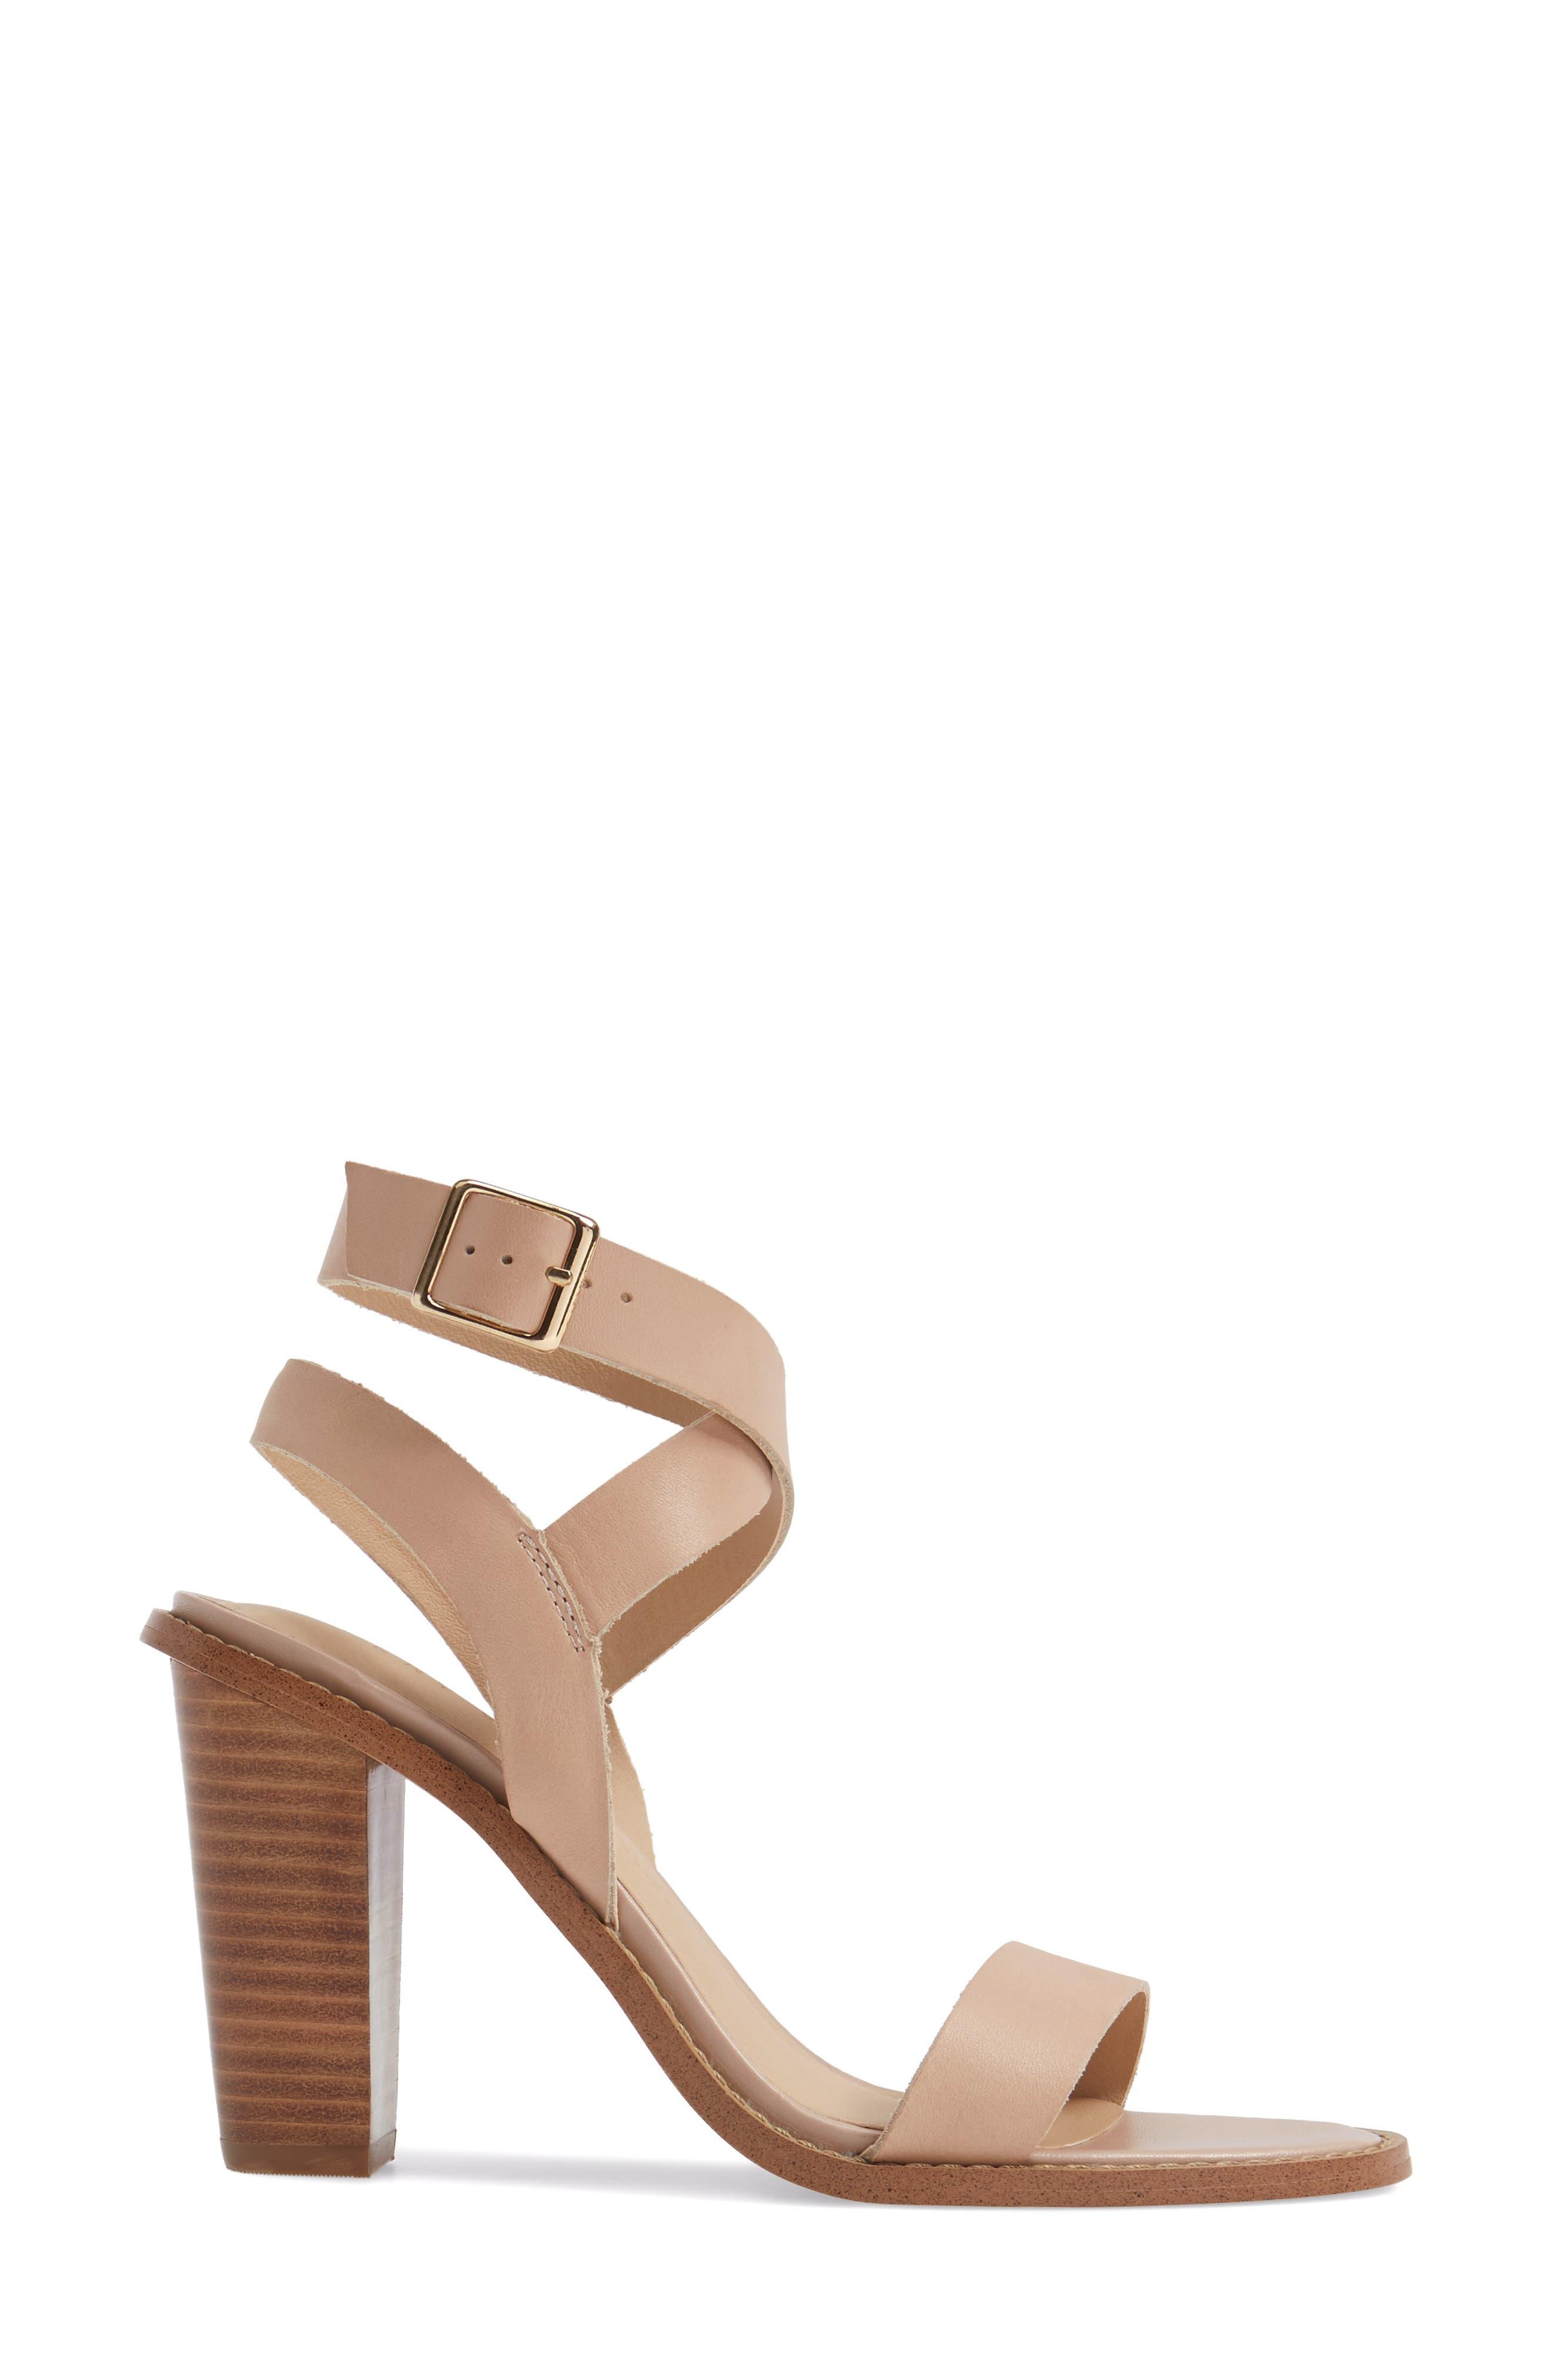 Alternate Image 3  - Very Volatile Poshy Ankle Wrap Sandal (Women)